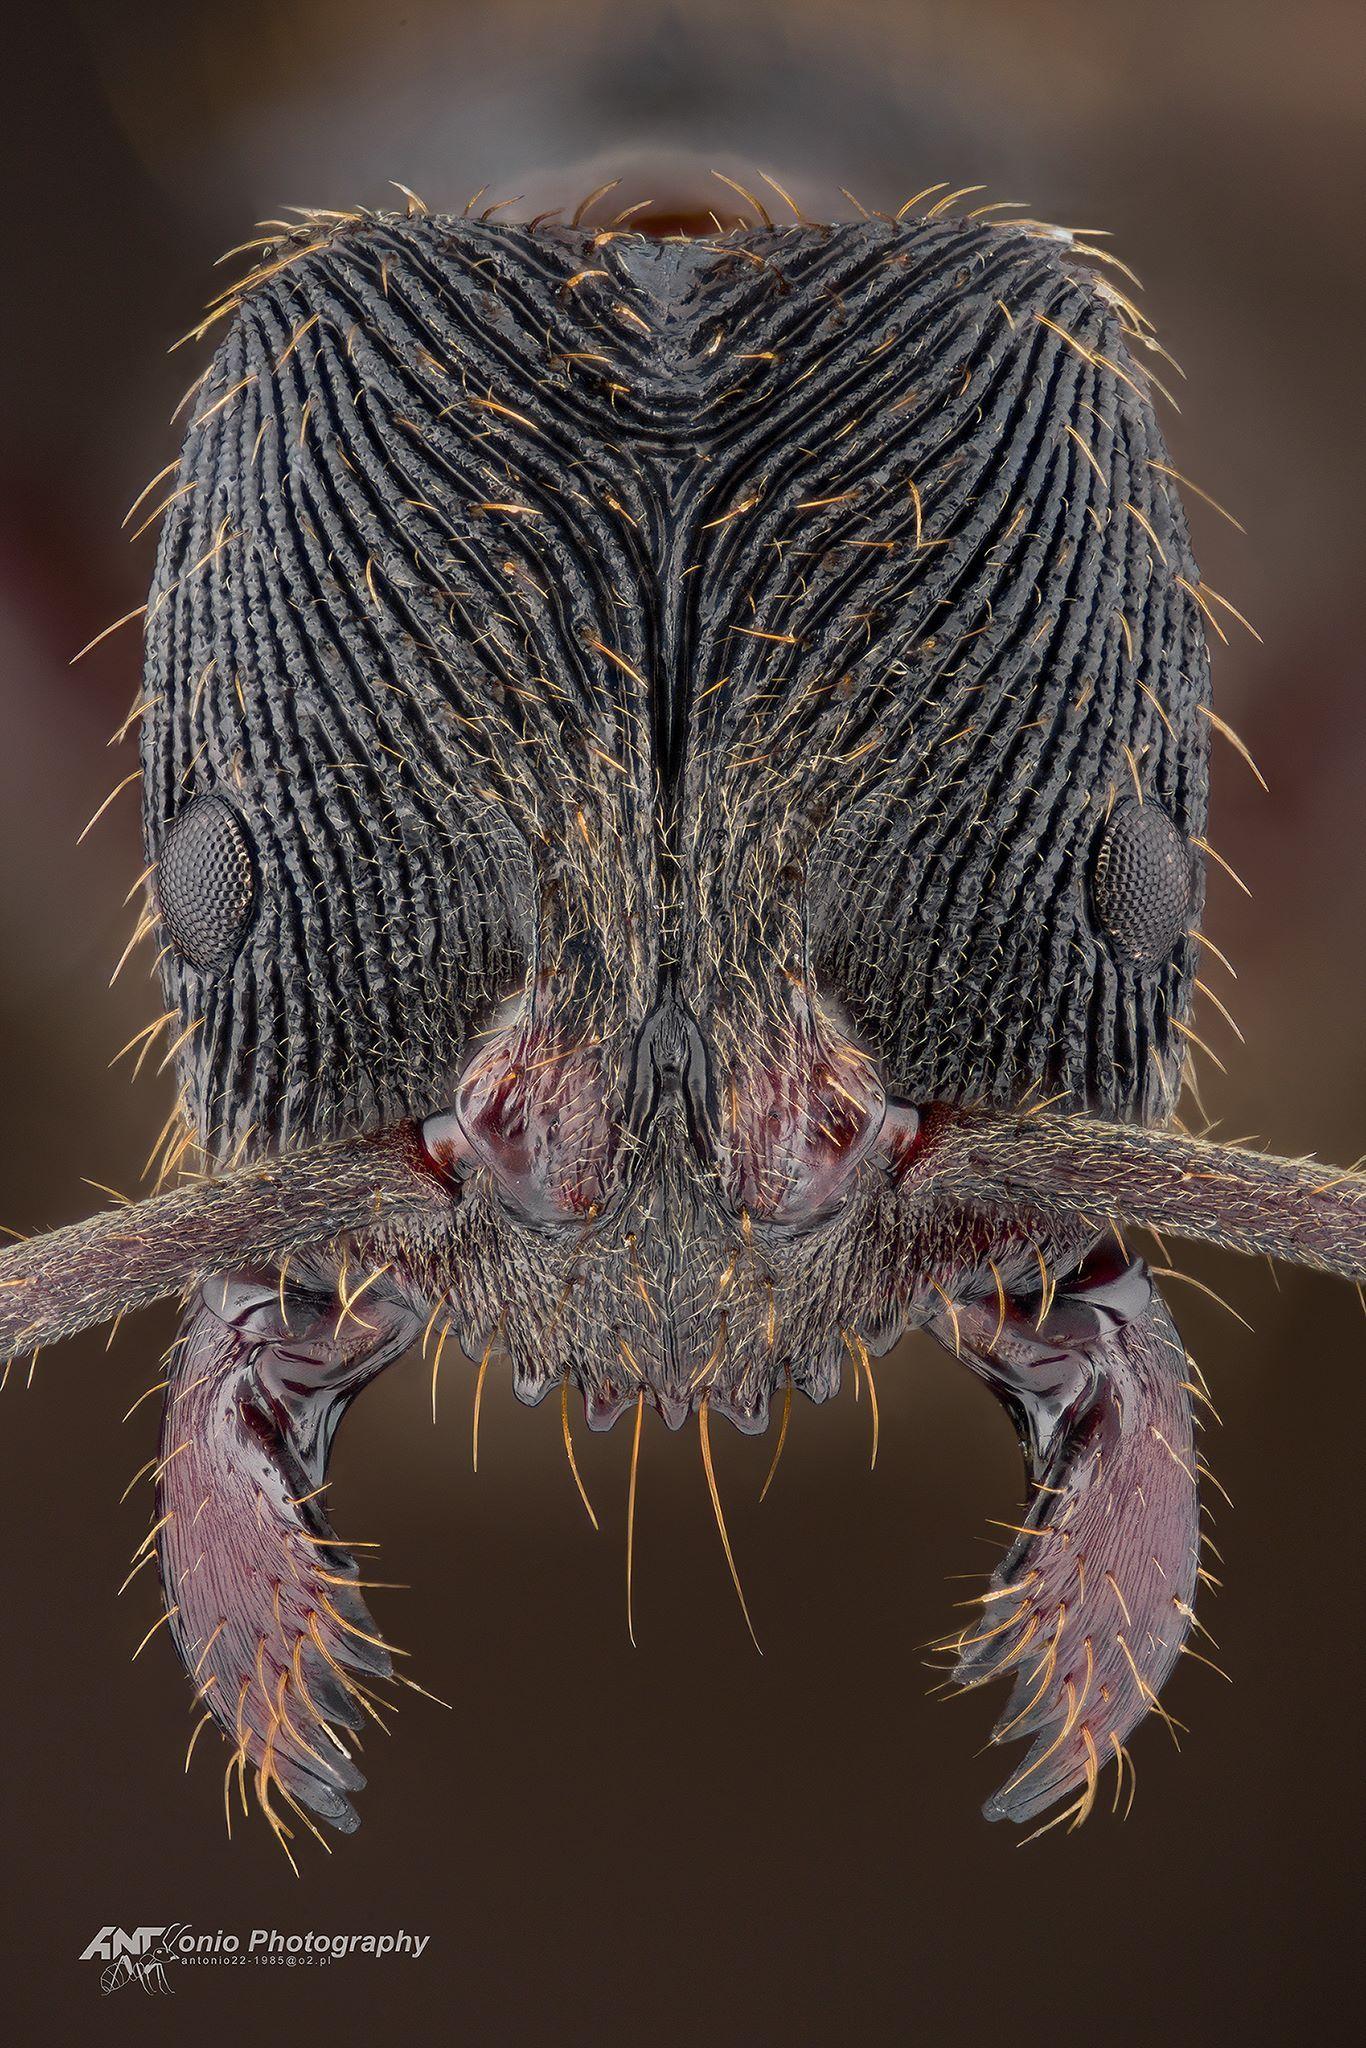 Odontoponera Denticulata 画像あり 虫 微生物